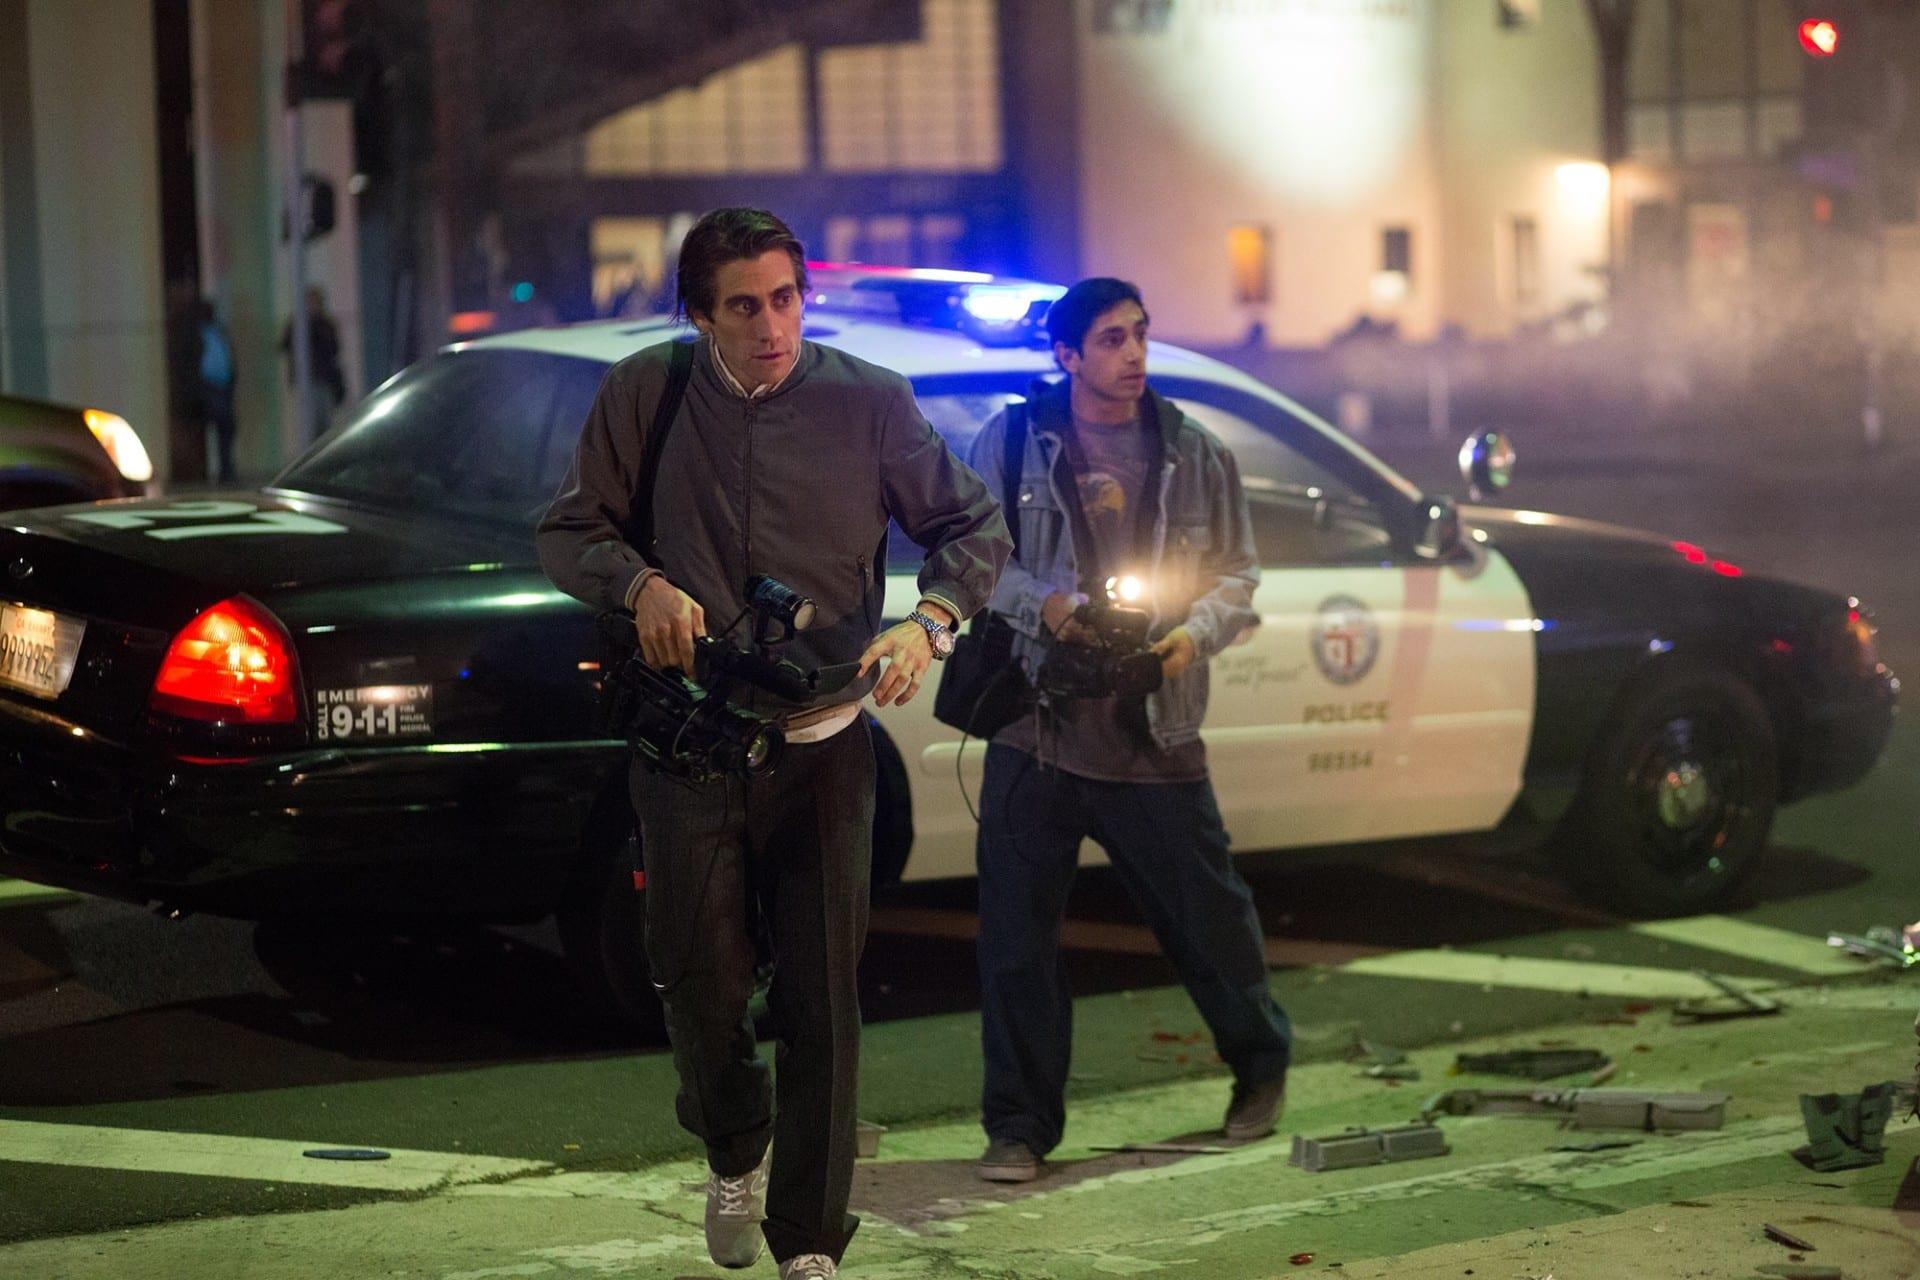 Toronto International Film Festival 2014: Dan Gilroy's Nightcrawler